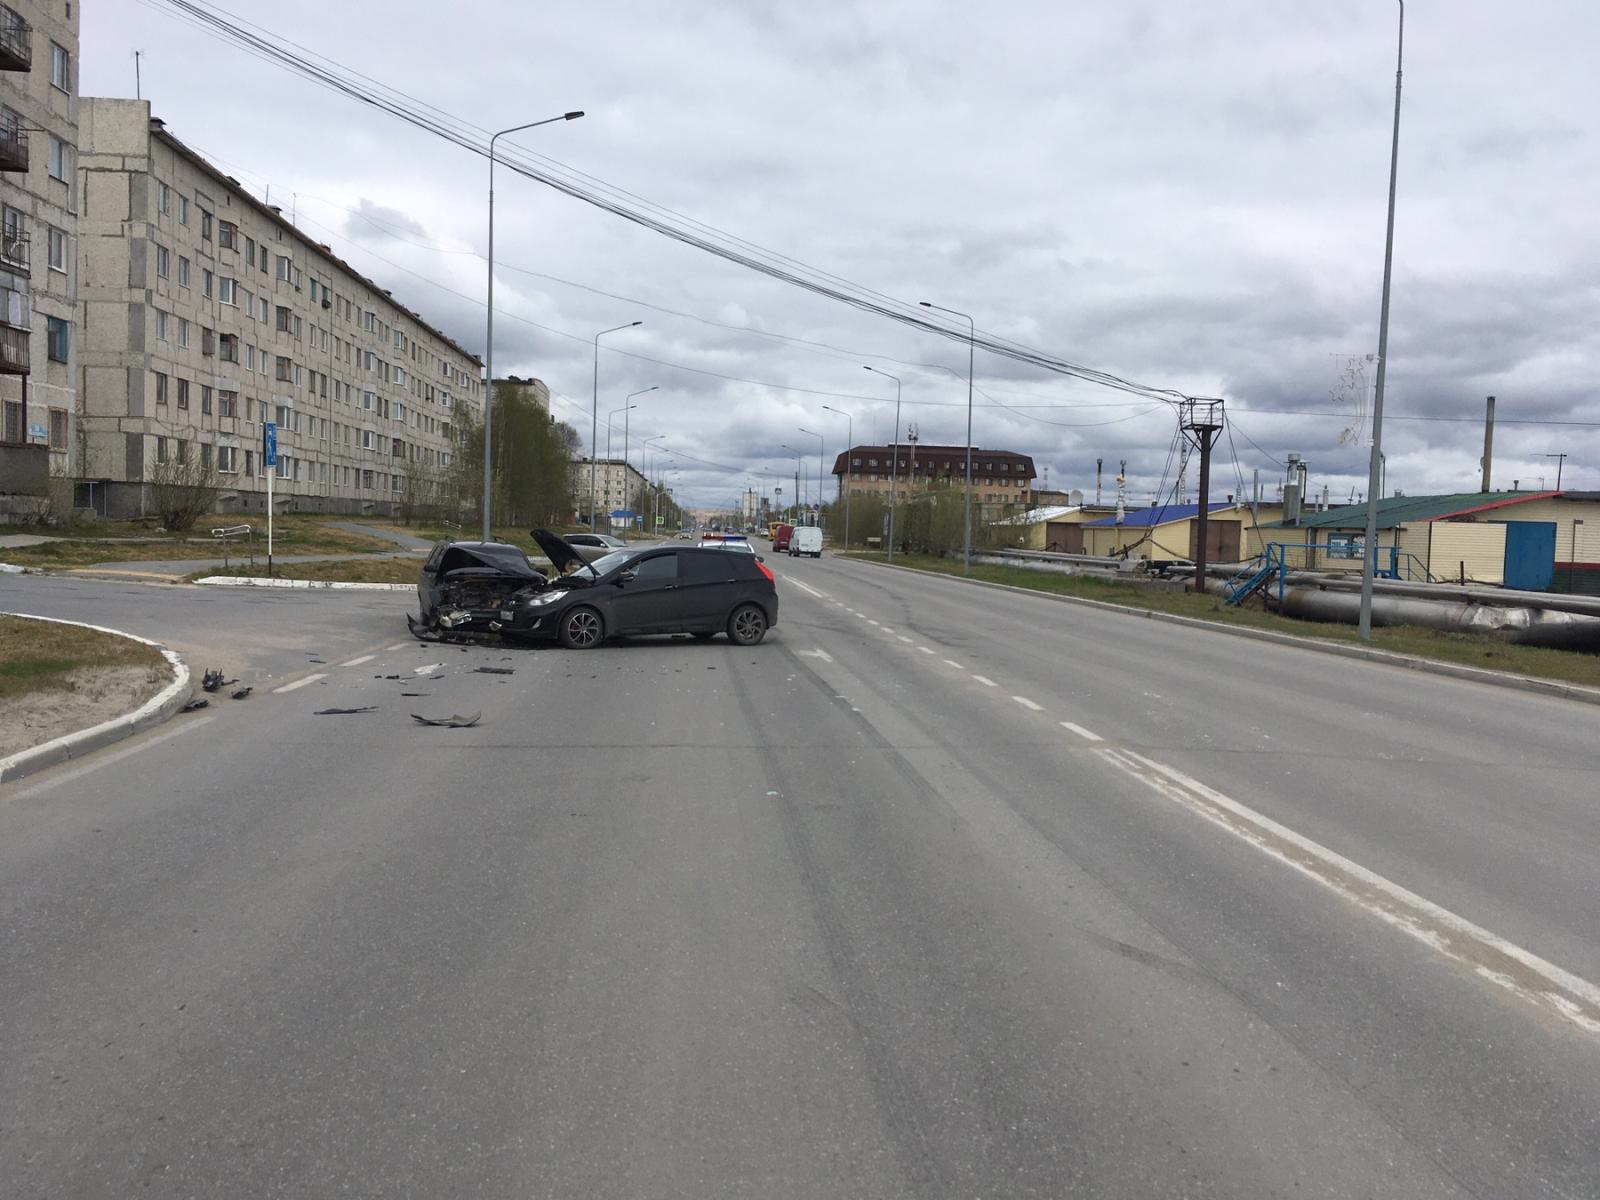 12 ДТП произошло на дорогах Ямала за сутки